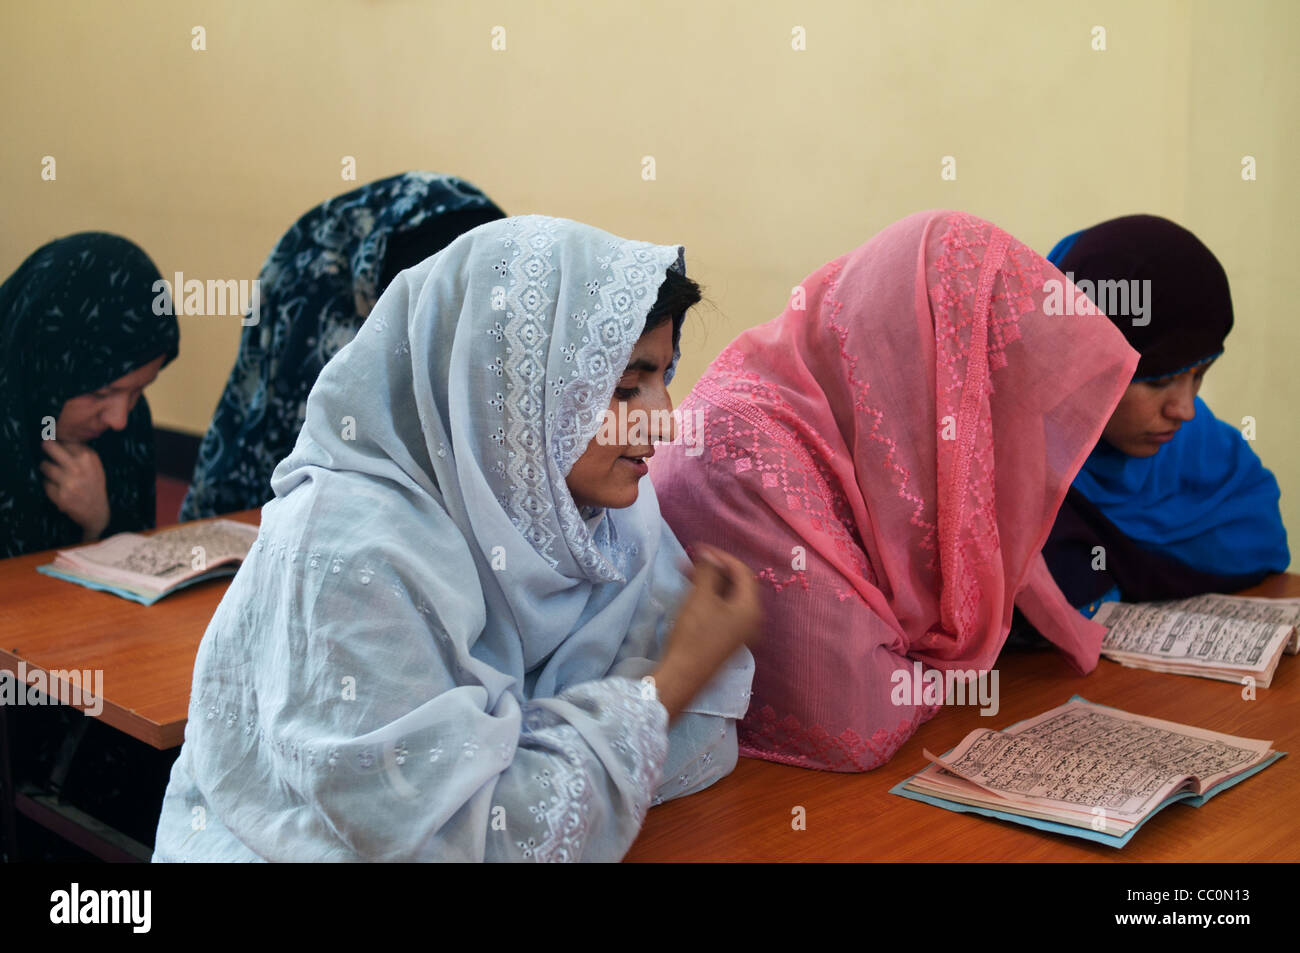 Herat Women's prison. Women prisoners reading the Holy Koran. - Stock Image